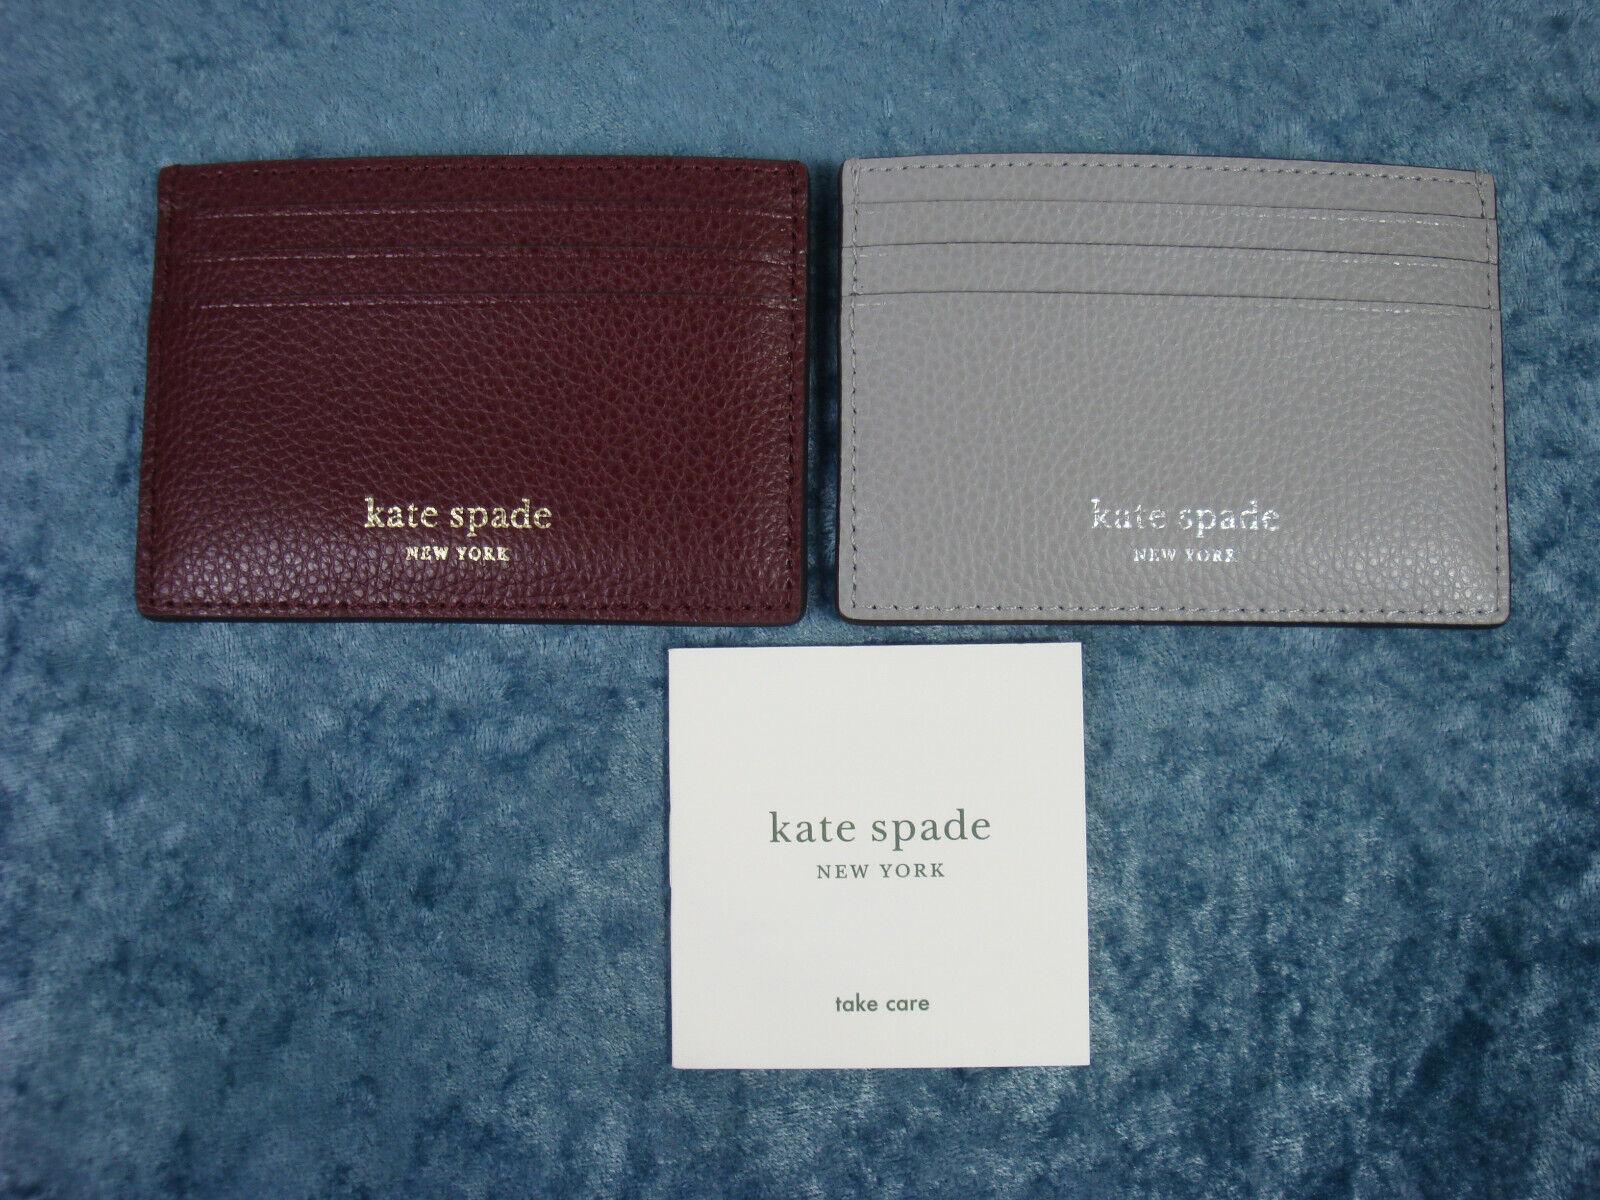 Kate Spade Eva Small Slim Card Holder WLRU6277~Cherrywood or Grey~NWT!!!